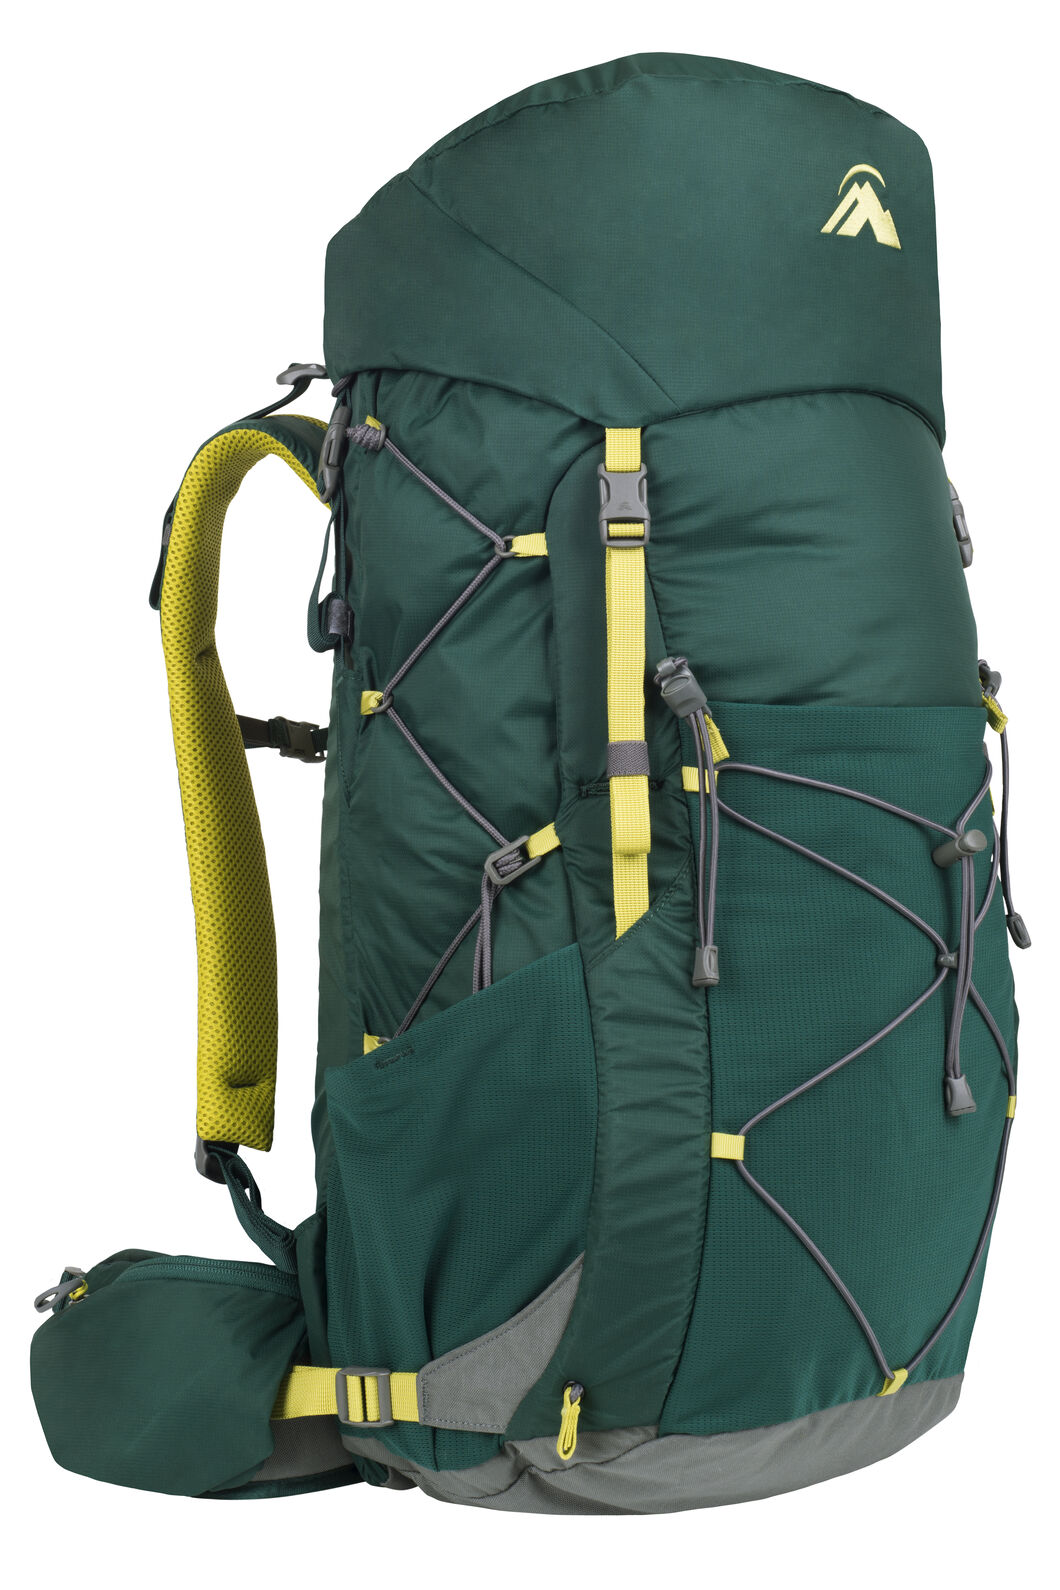 Macpac Fiord 1.1 40L Hiking Pack, Botanical Garden, hi-res